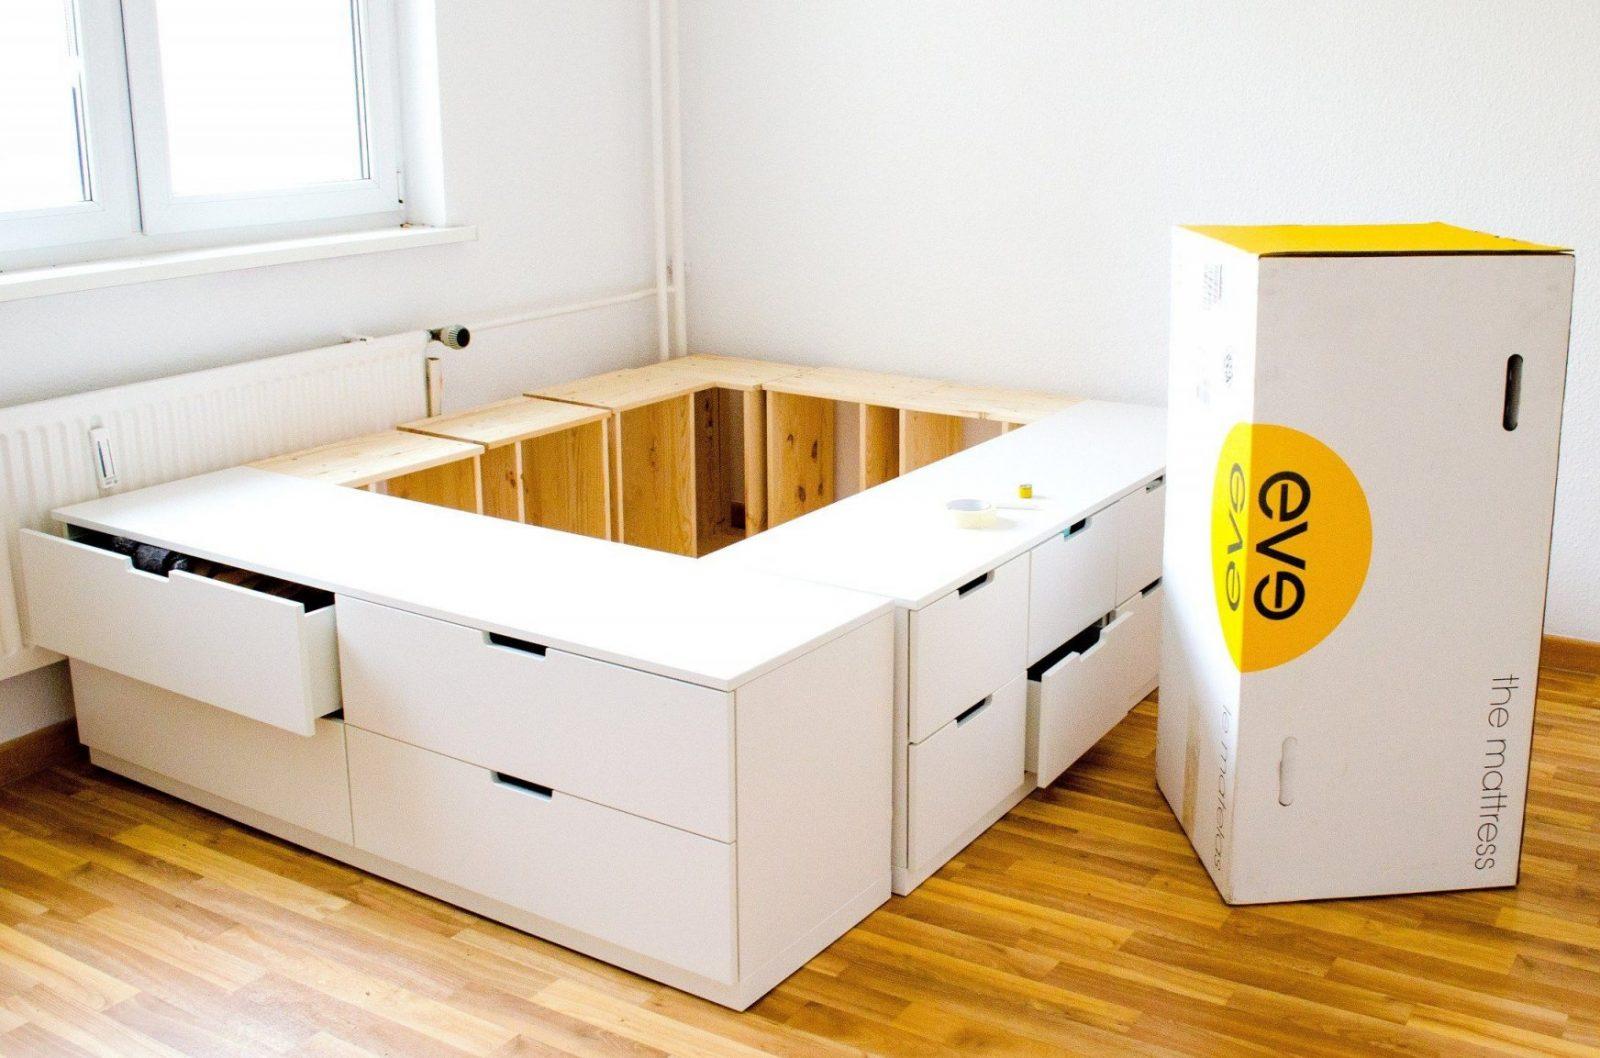 Diy Ikea Hack Plattformbett Selber Bauen Aus Ikea Kommoden Lego Bett von Plattform Bett Selber Bauen Bild